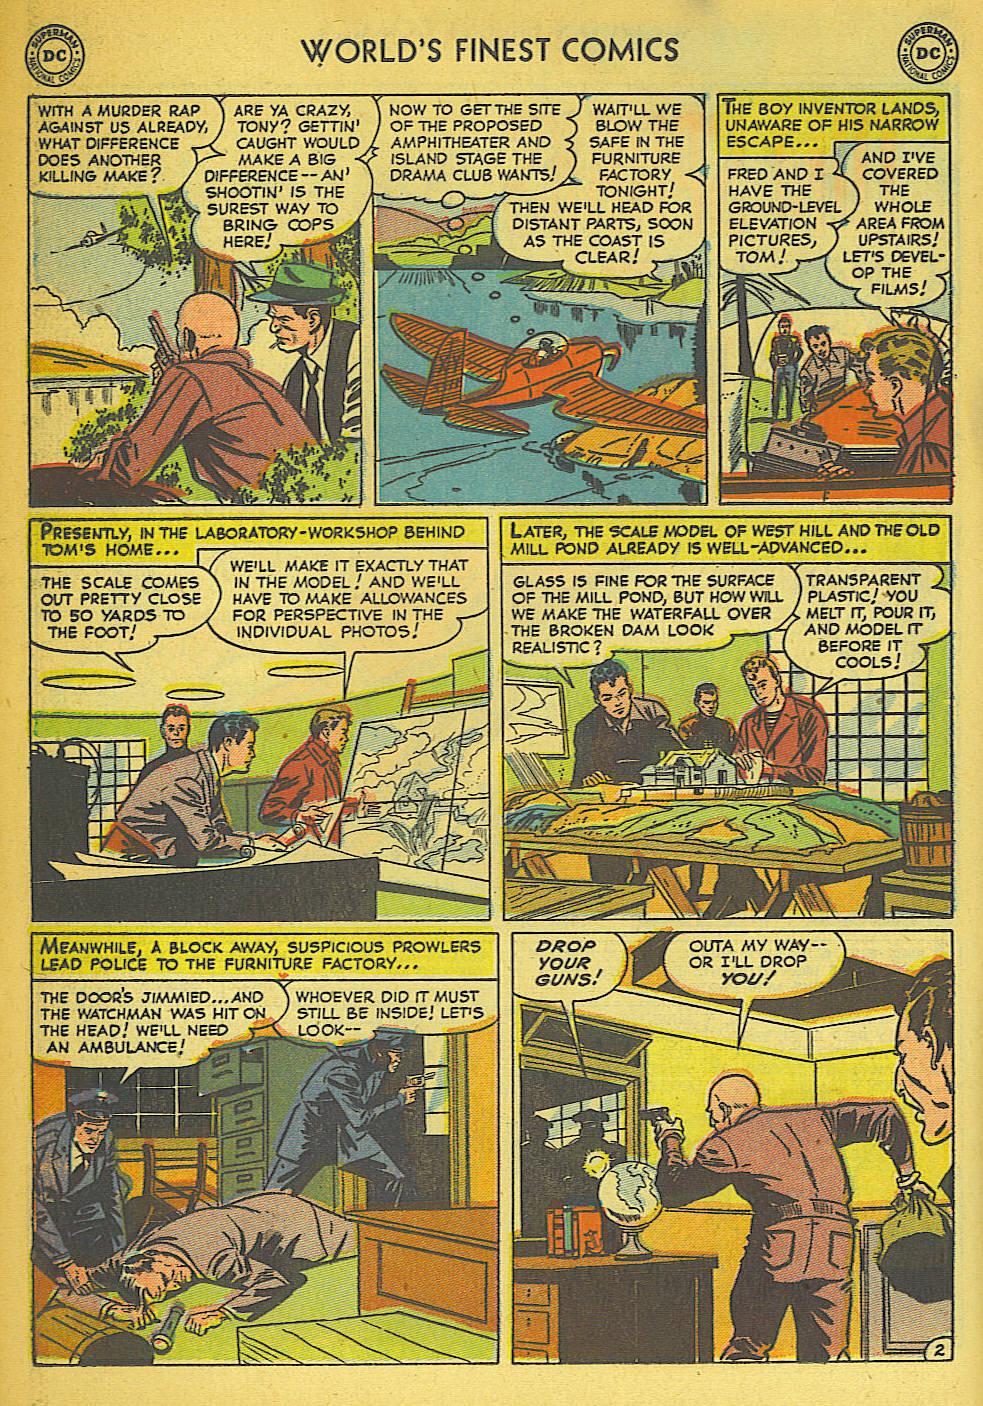 Read online World's Finest Comics comic -  Issue #57 - 42